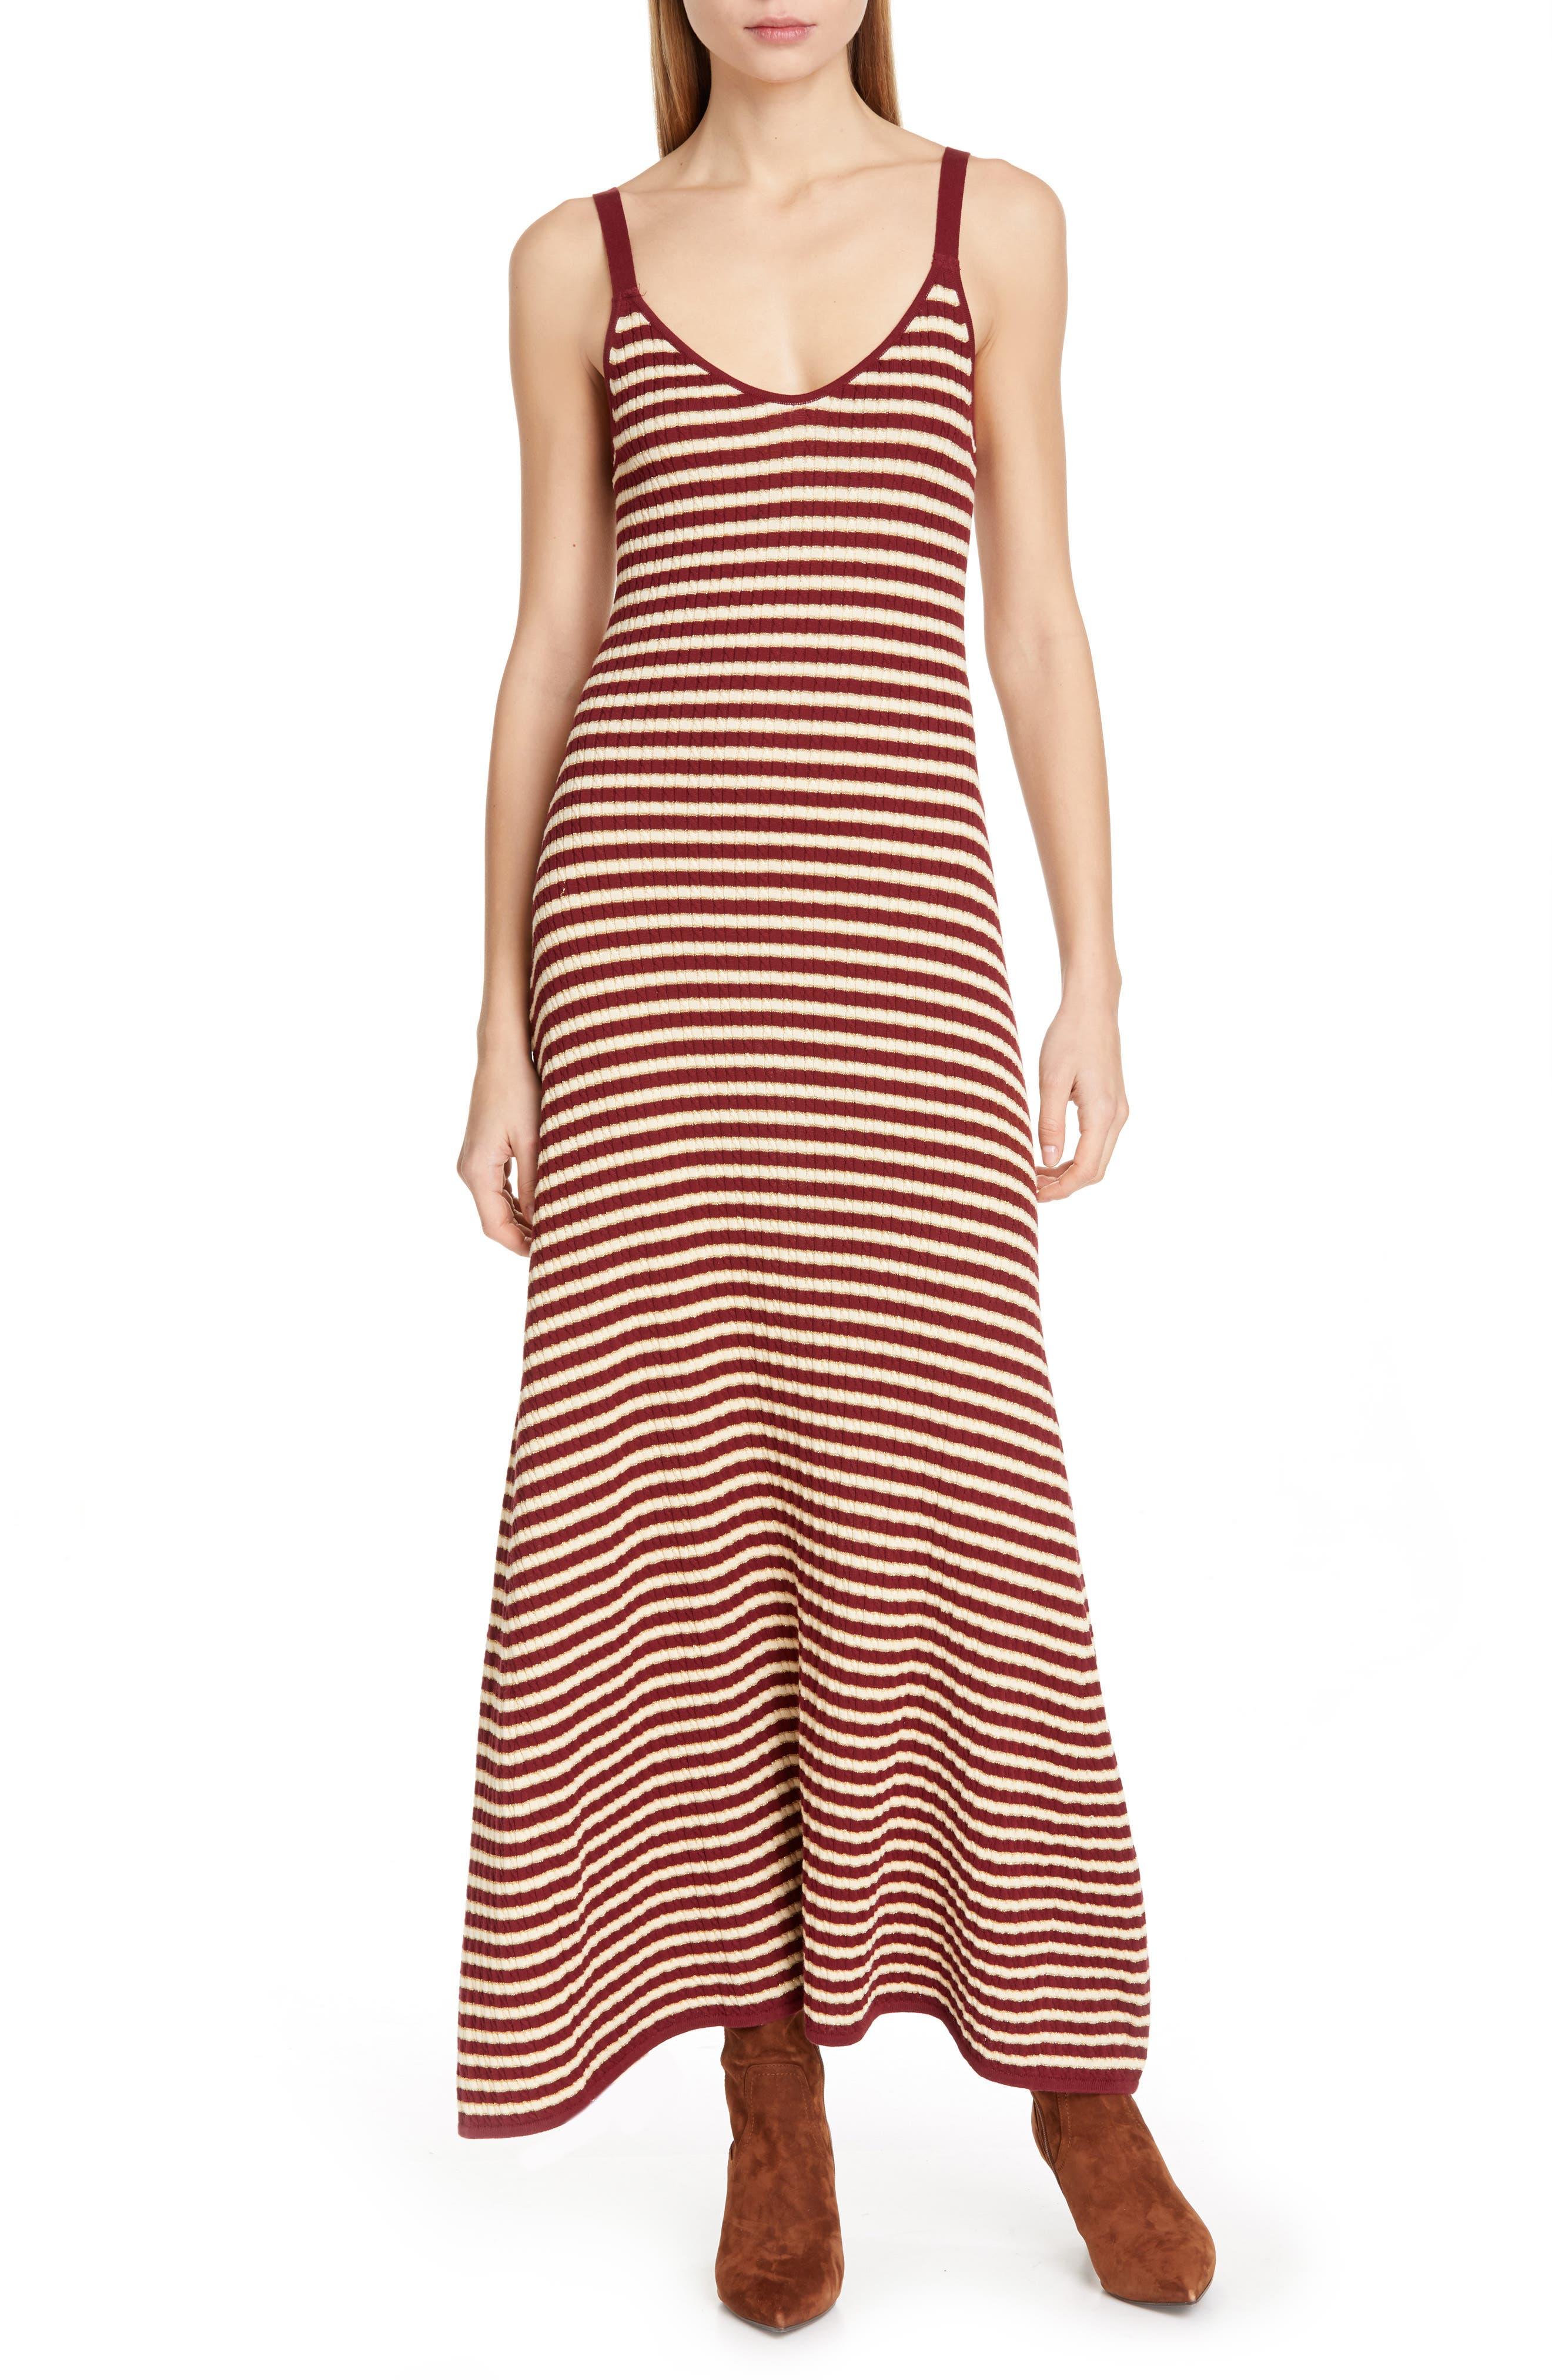 Tommy X Zendaya Stripe Tank Dress, Burgundy (Nordstrom Exclusive)